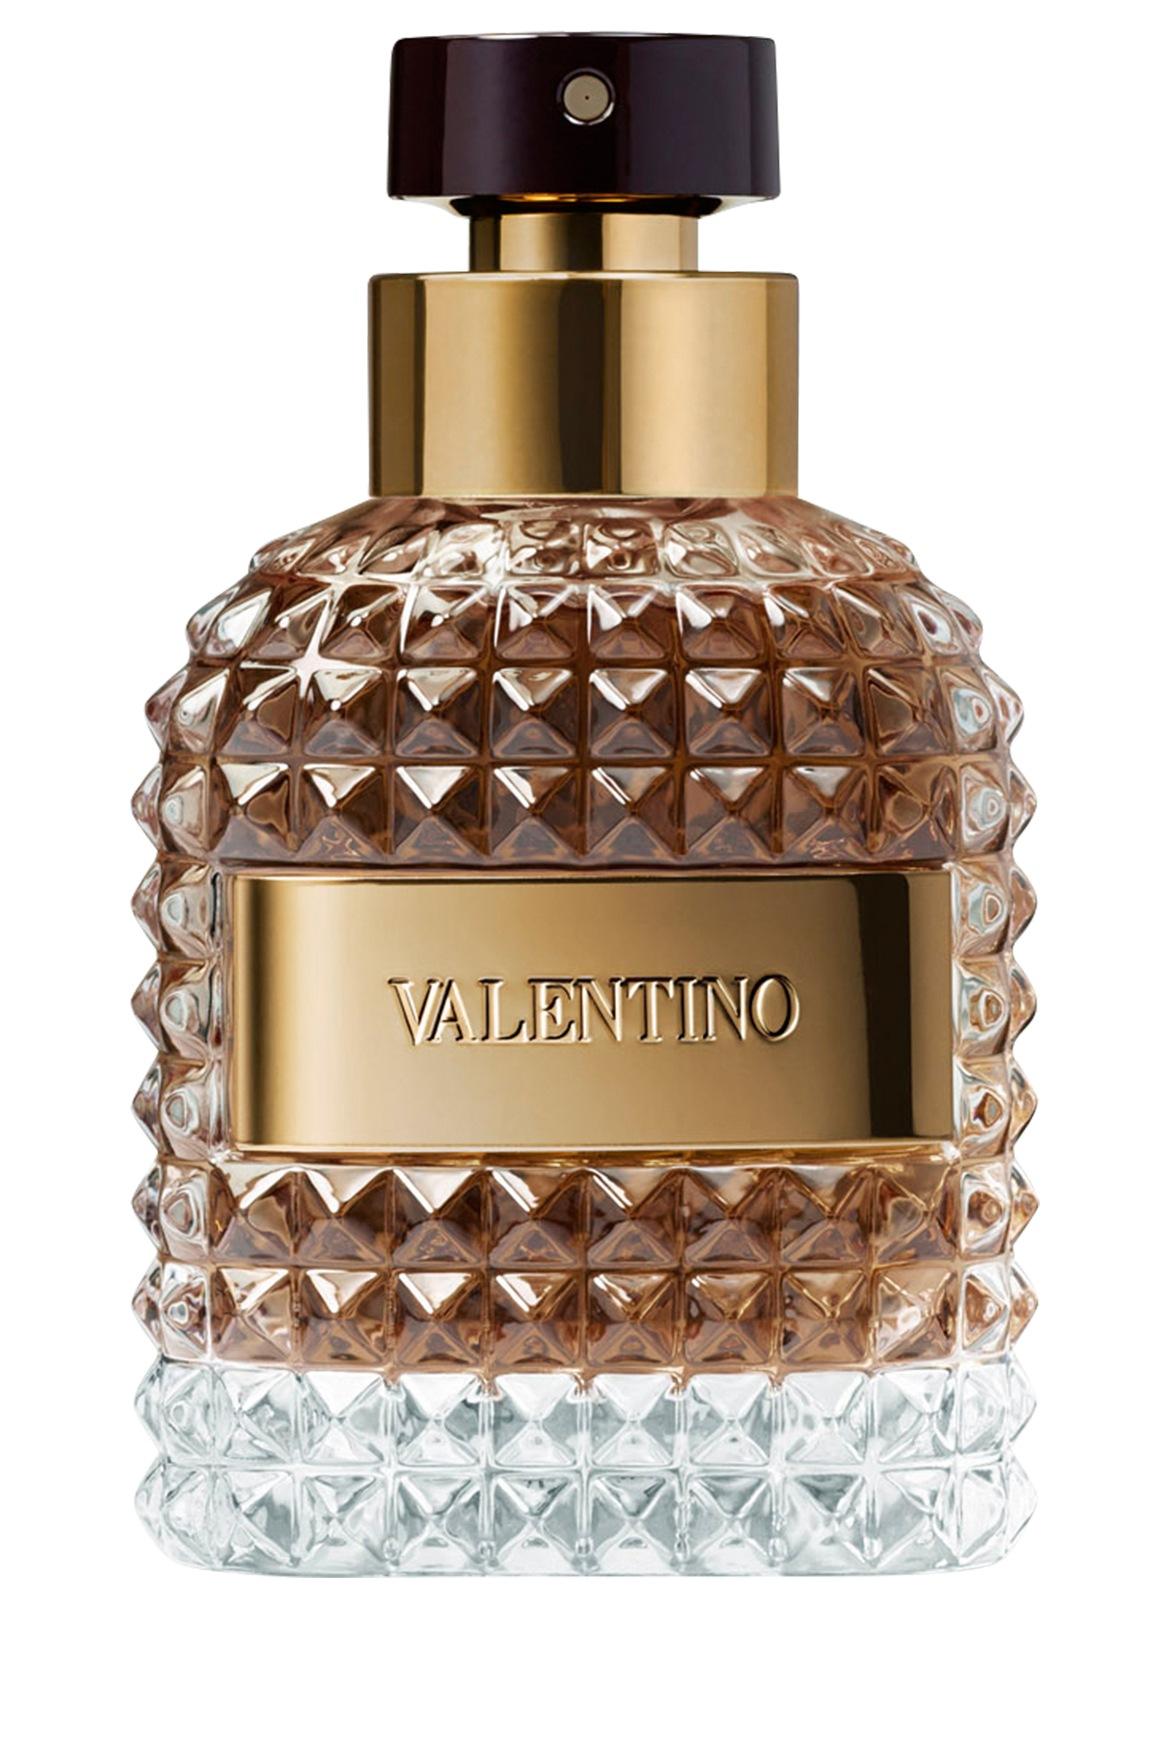 amateur vids valentino perfume myer